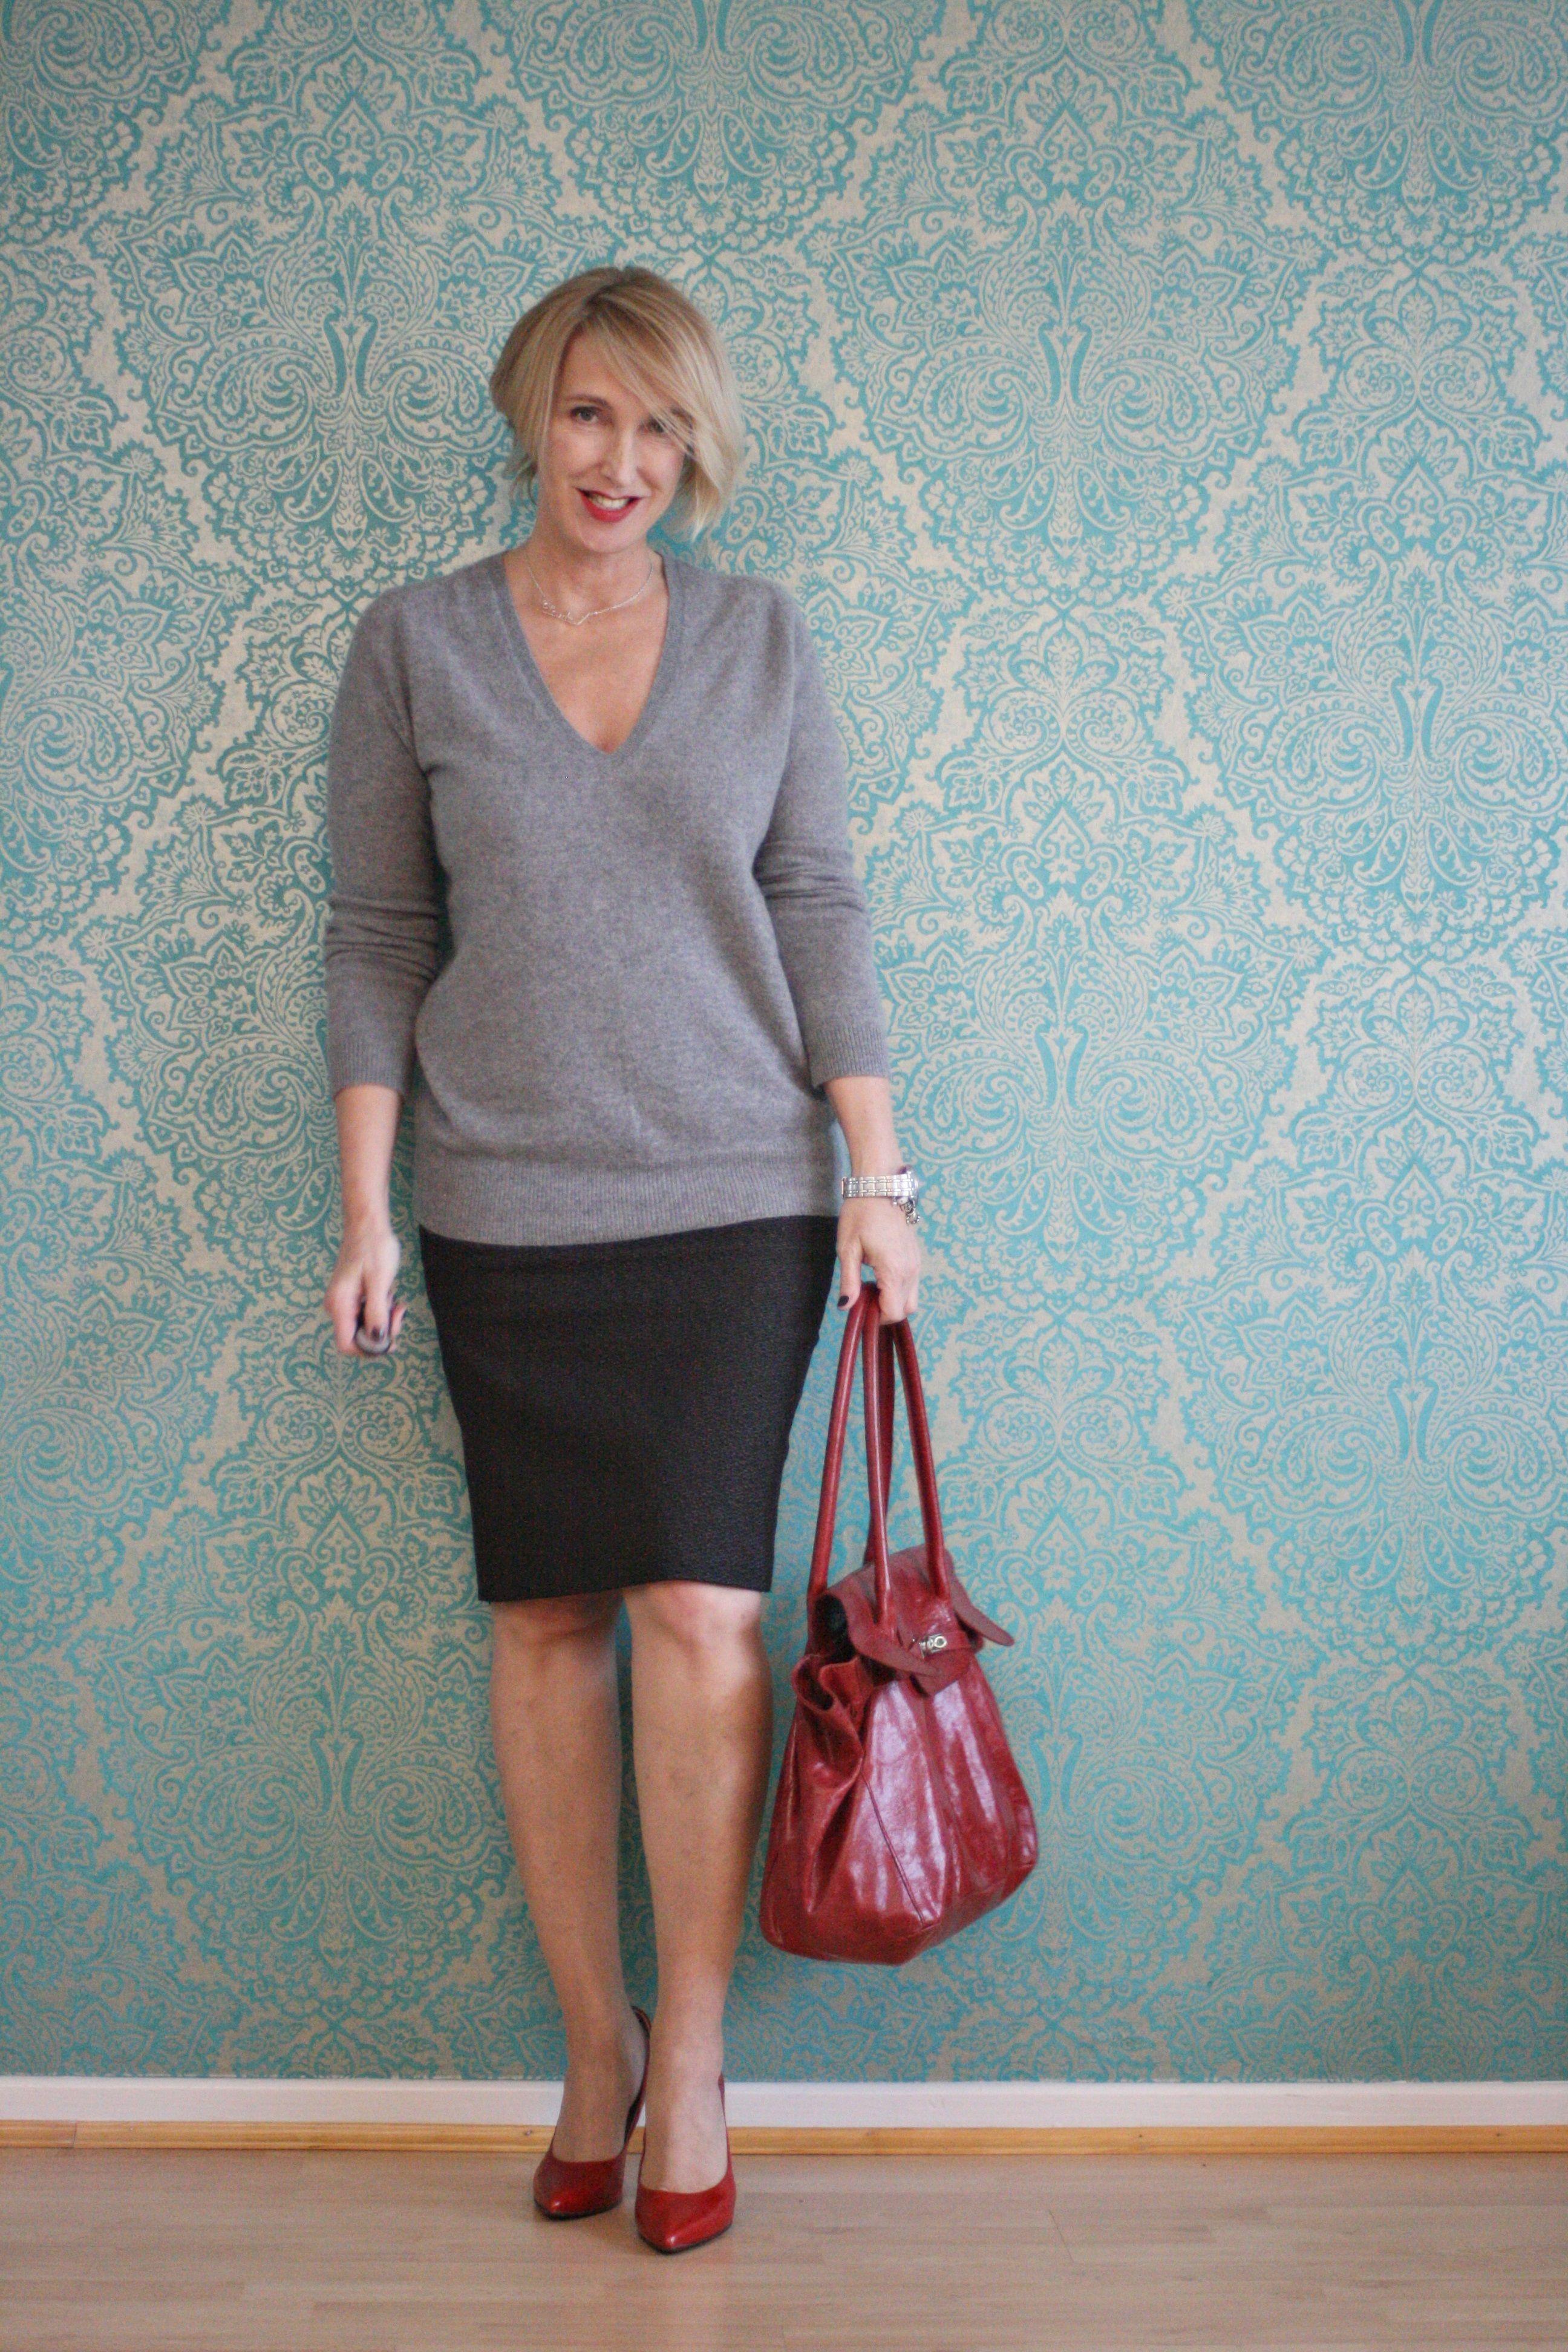 Fashion shoes for mature women